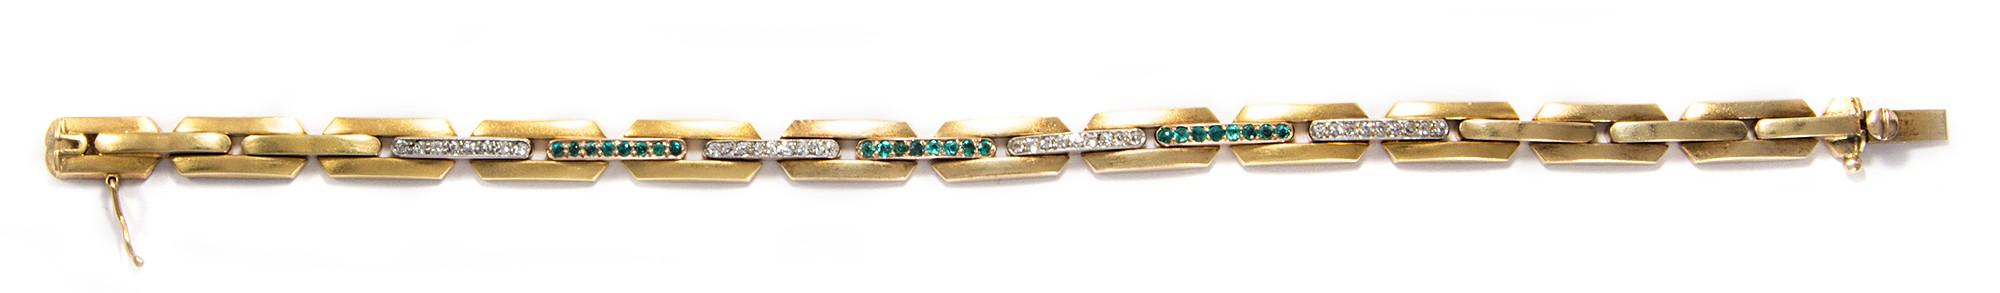 b9dd2c411d60 Samtig golden - Feines Jugendstil Armband aus Gold, Smaragden und  Diamanten, um 1900.